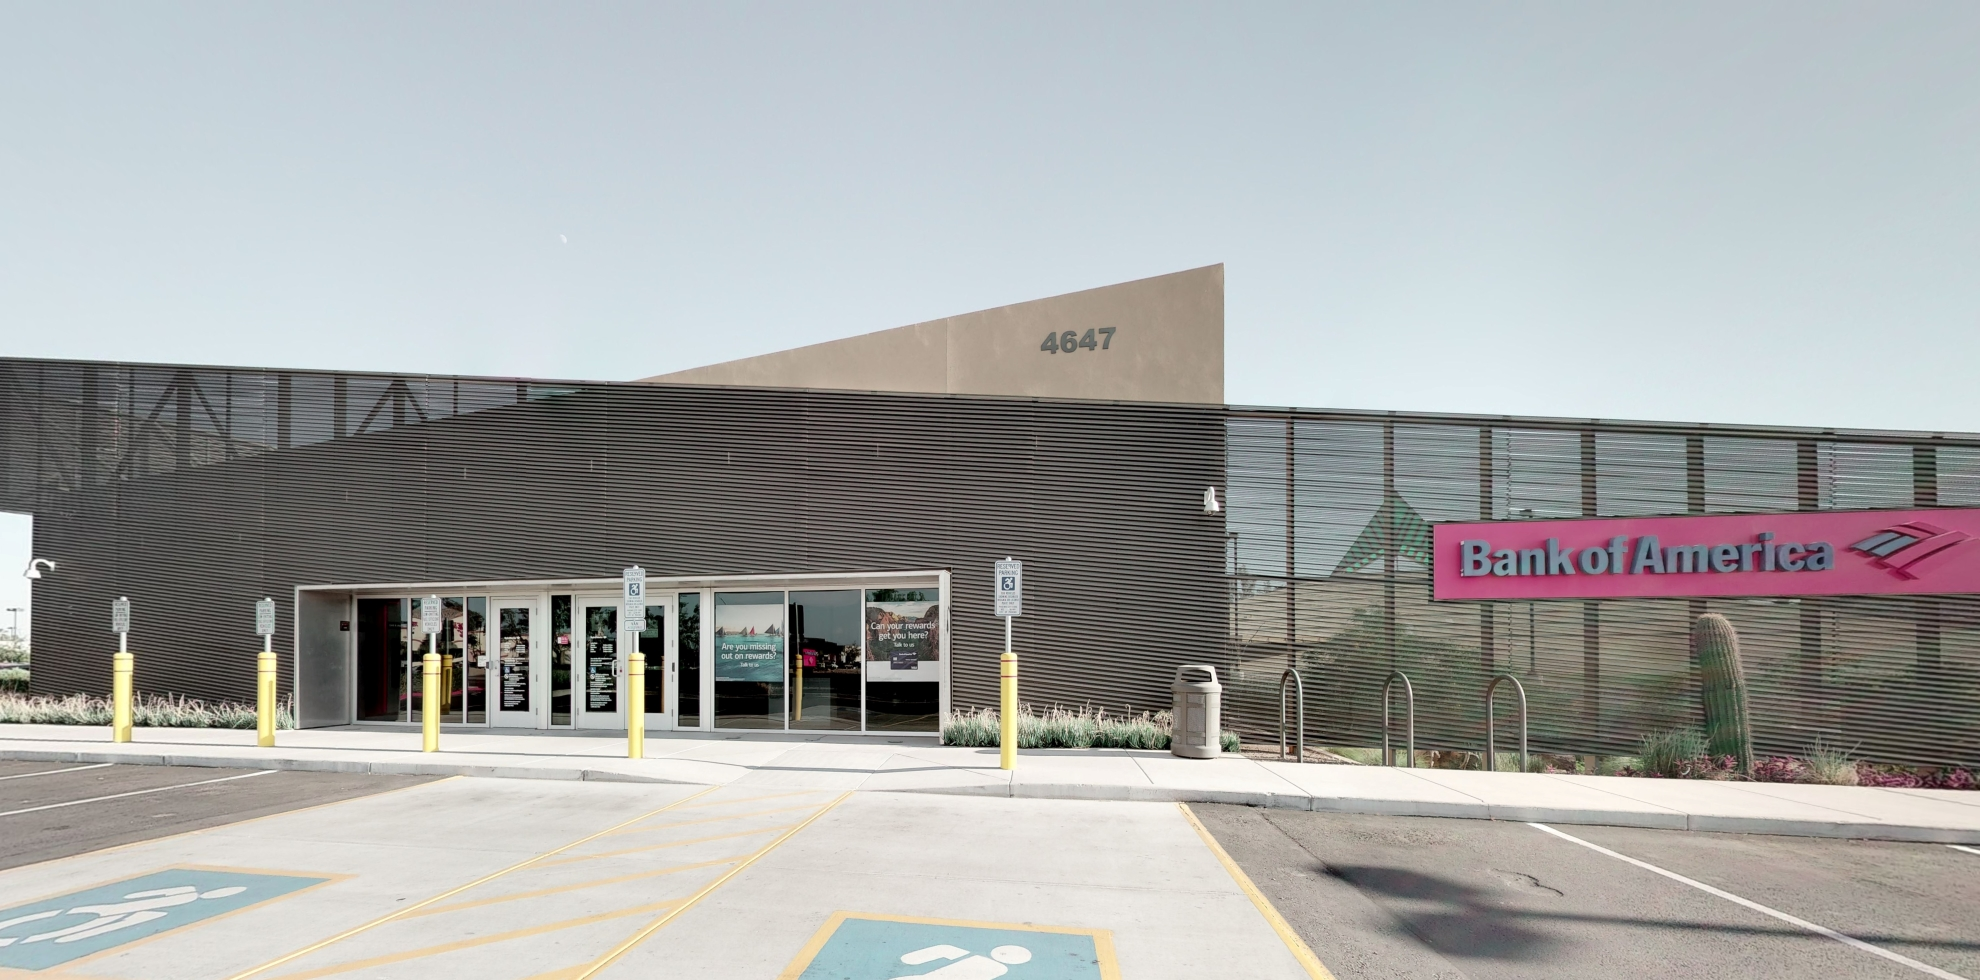 Bank of America financial center with drive-thru ATM | 4647 E Shea Blvd, Phoenix, AZ 85028